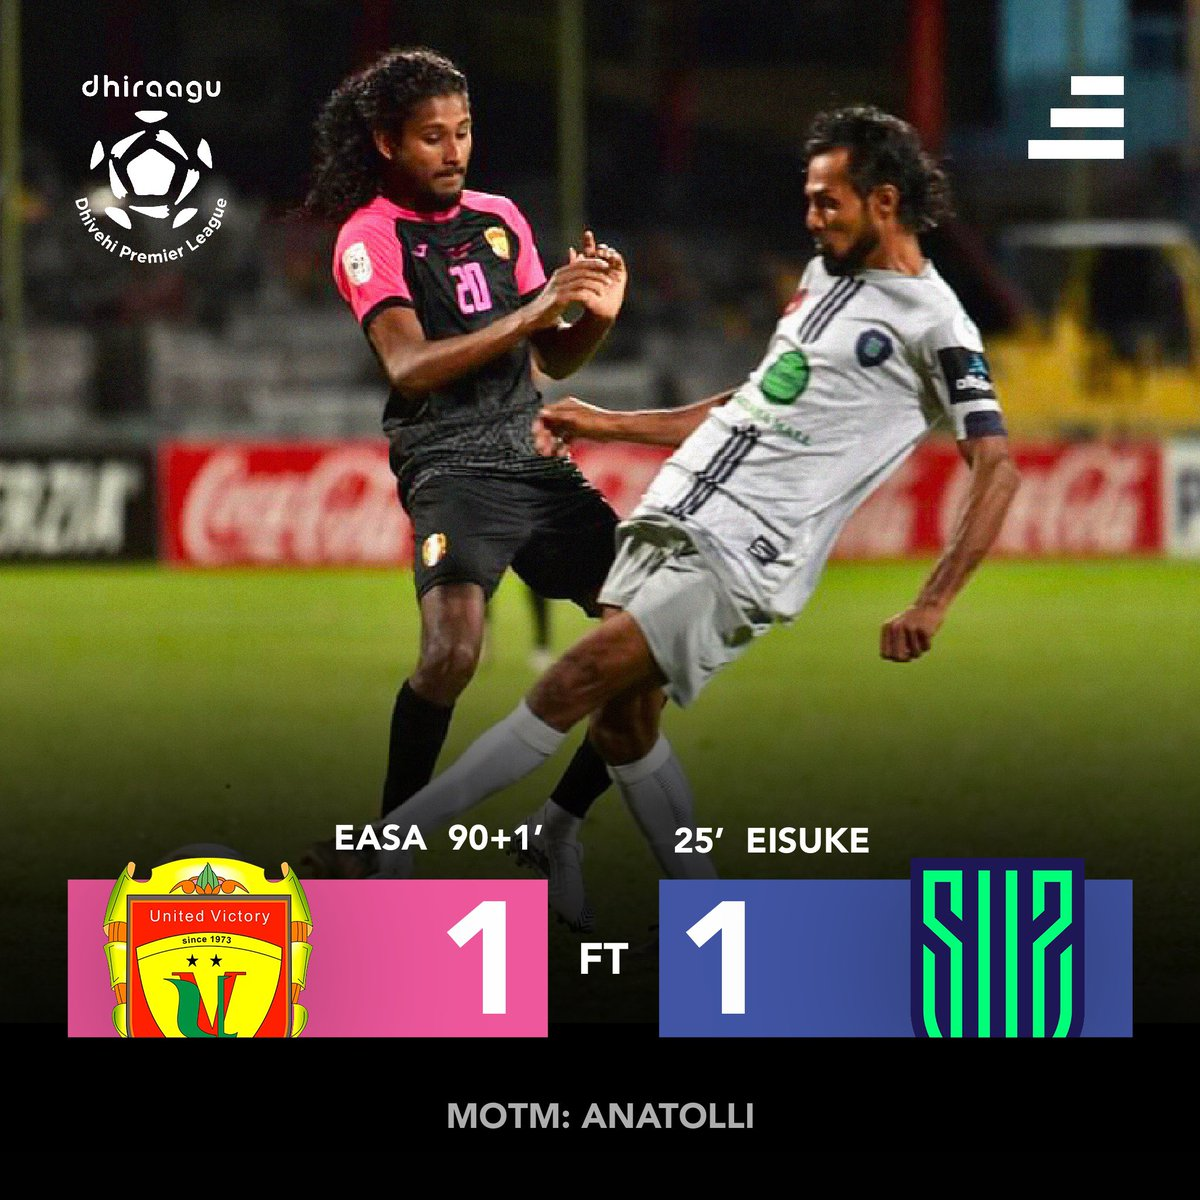 Dhiraagu Dhivehi Premier League 20/21  MATCH 24  Points shared, AGAIN.  MOTM: Anatolli  . . 📷 FAM . . #sidibari #sports #football #maldives #dhivehifutuboalha #fam #ddpl #UVSUS